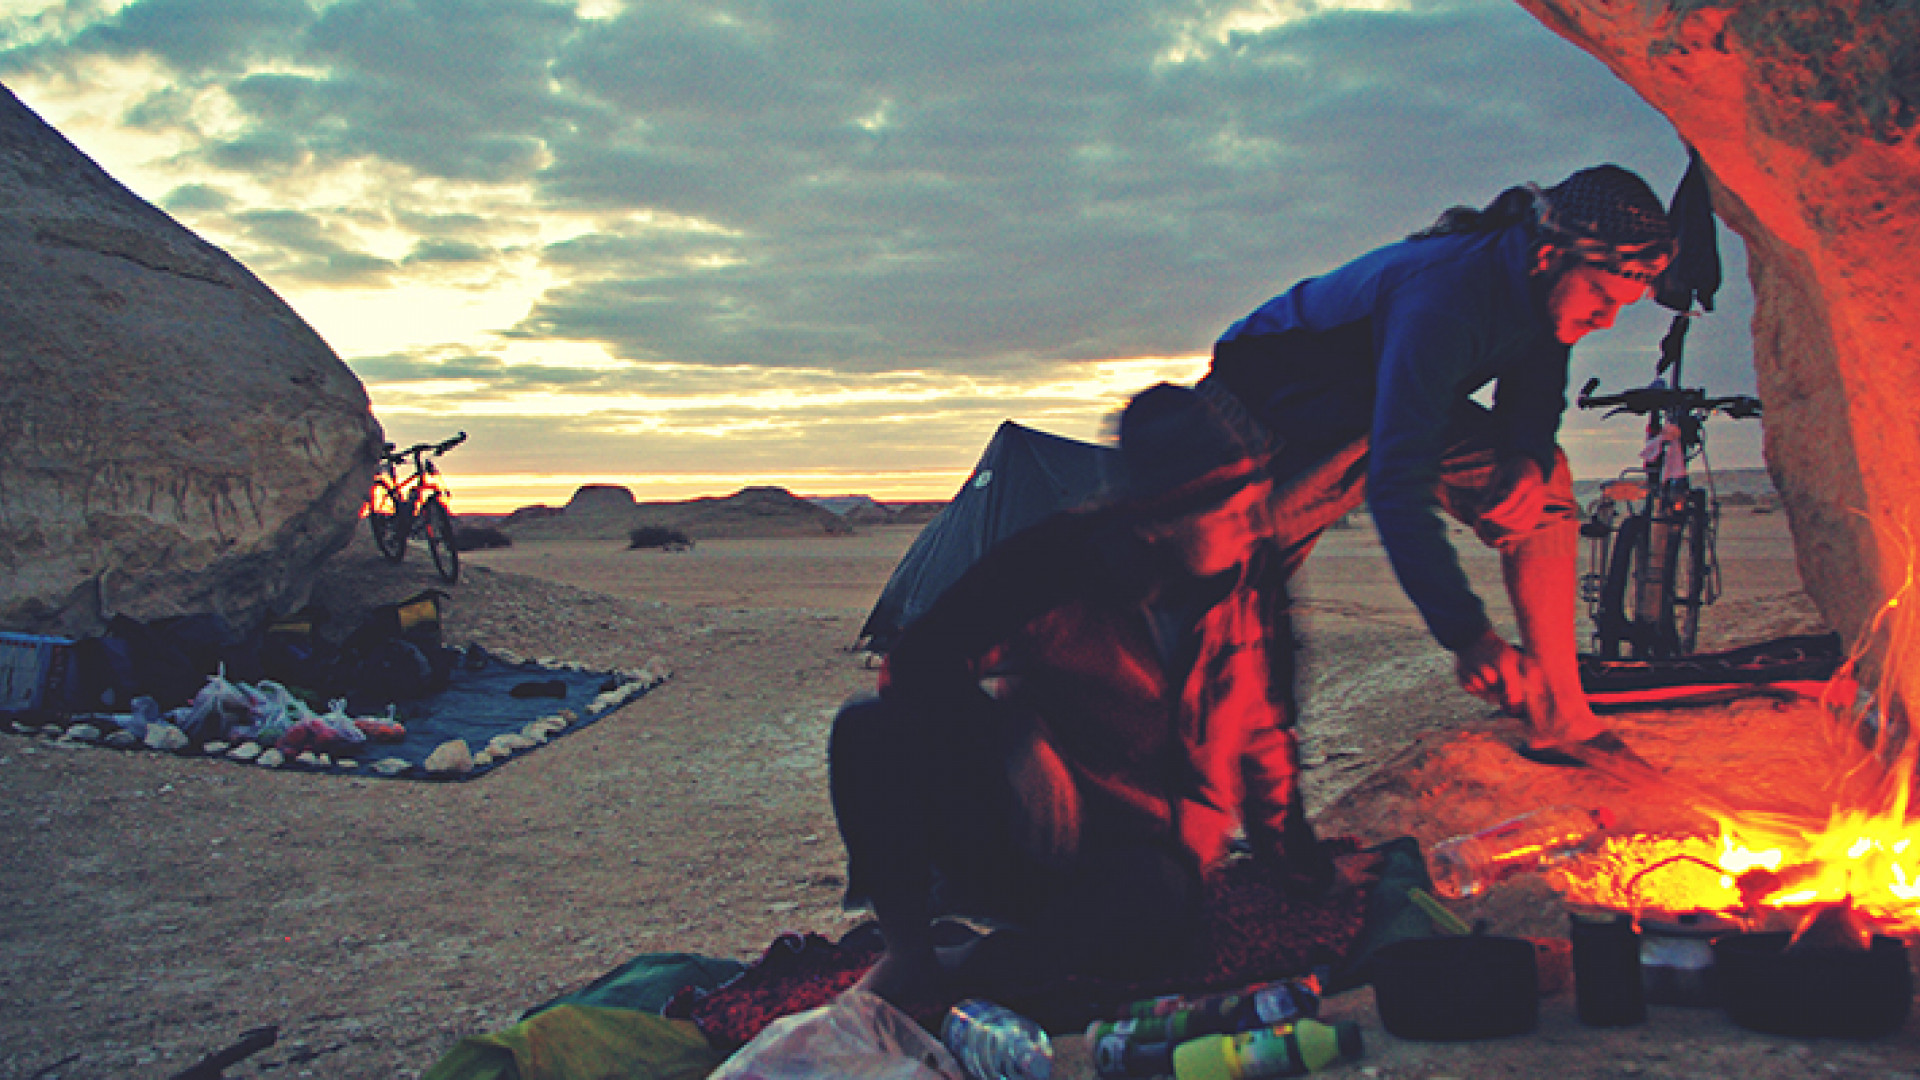 Camp-fire-in-the-White-Desert